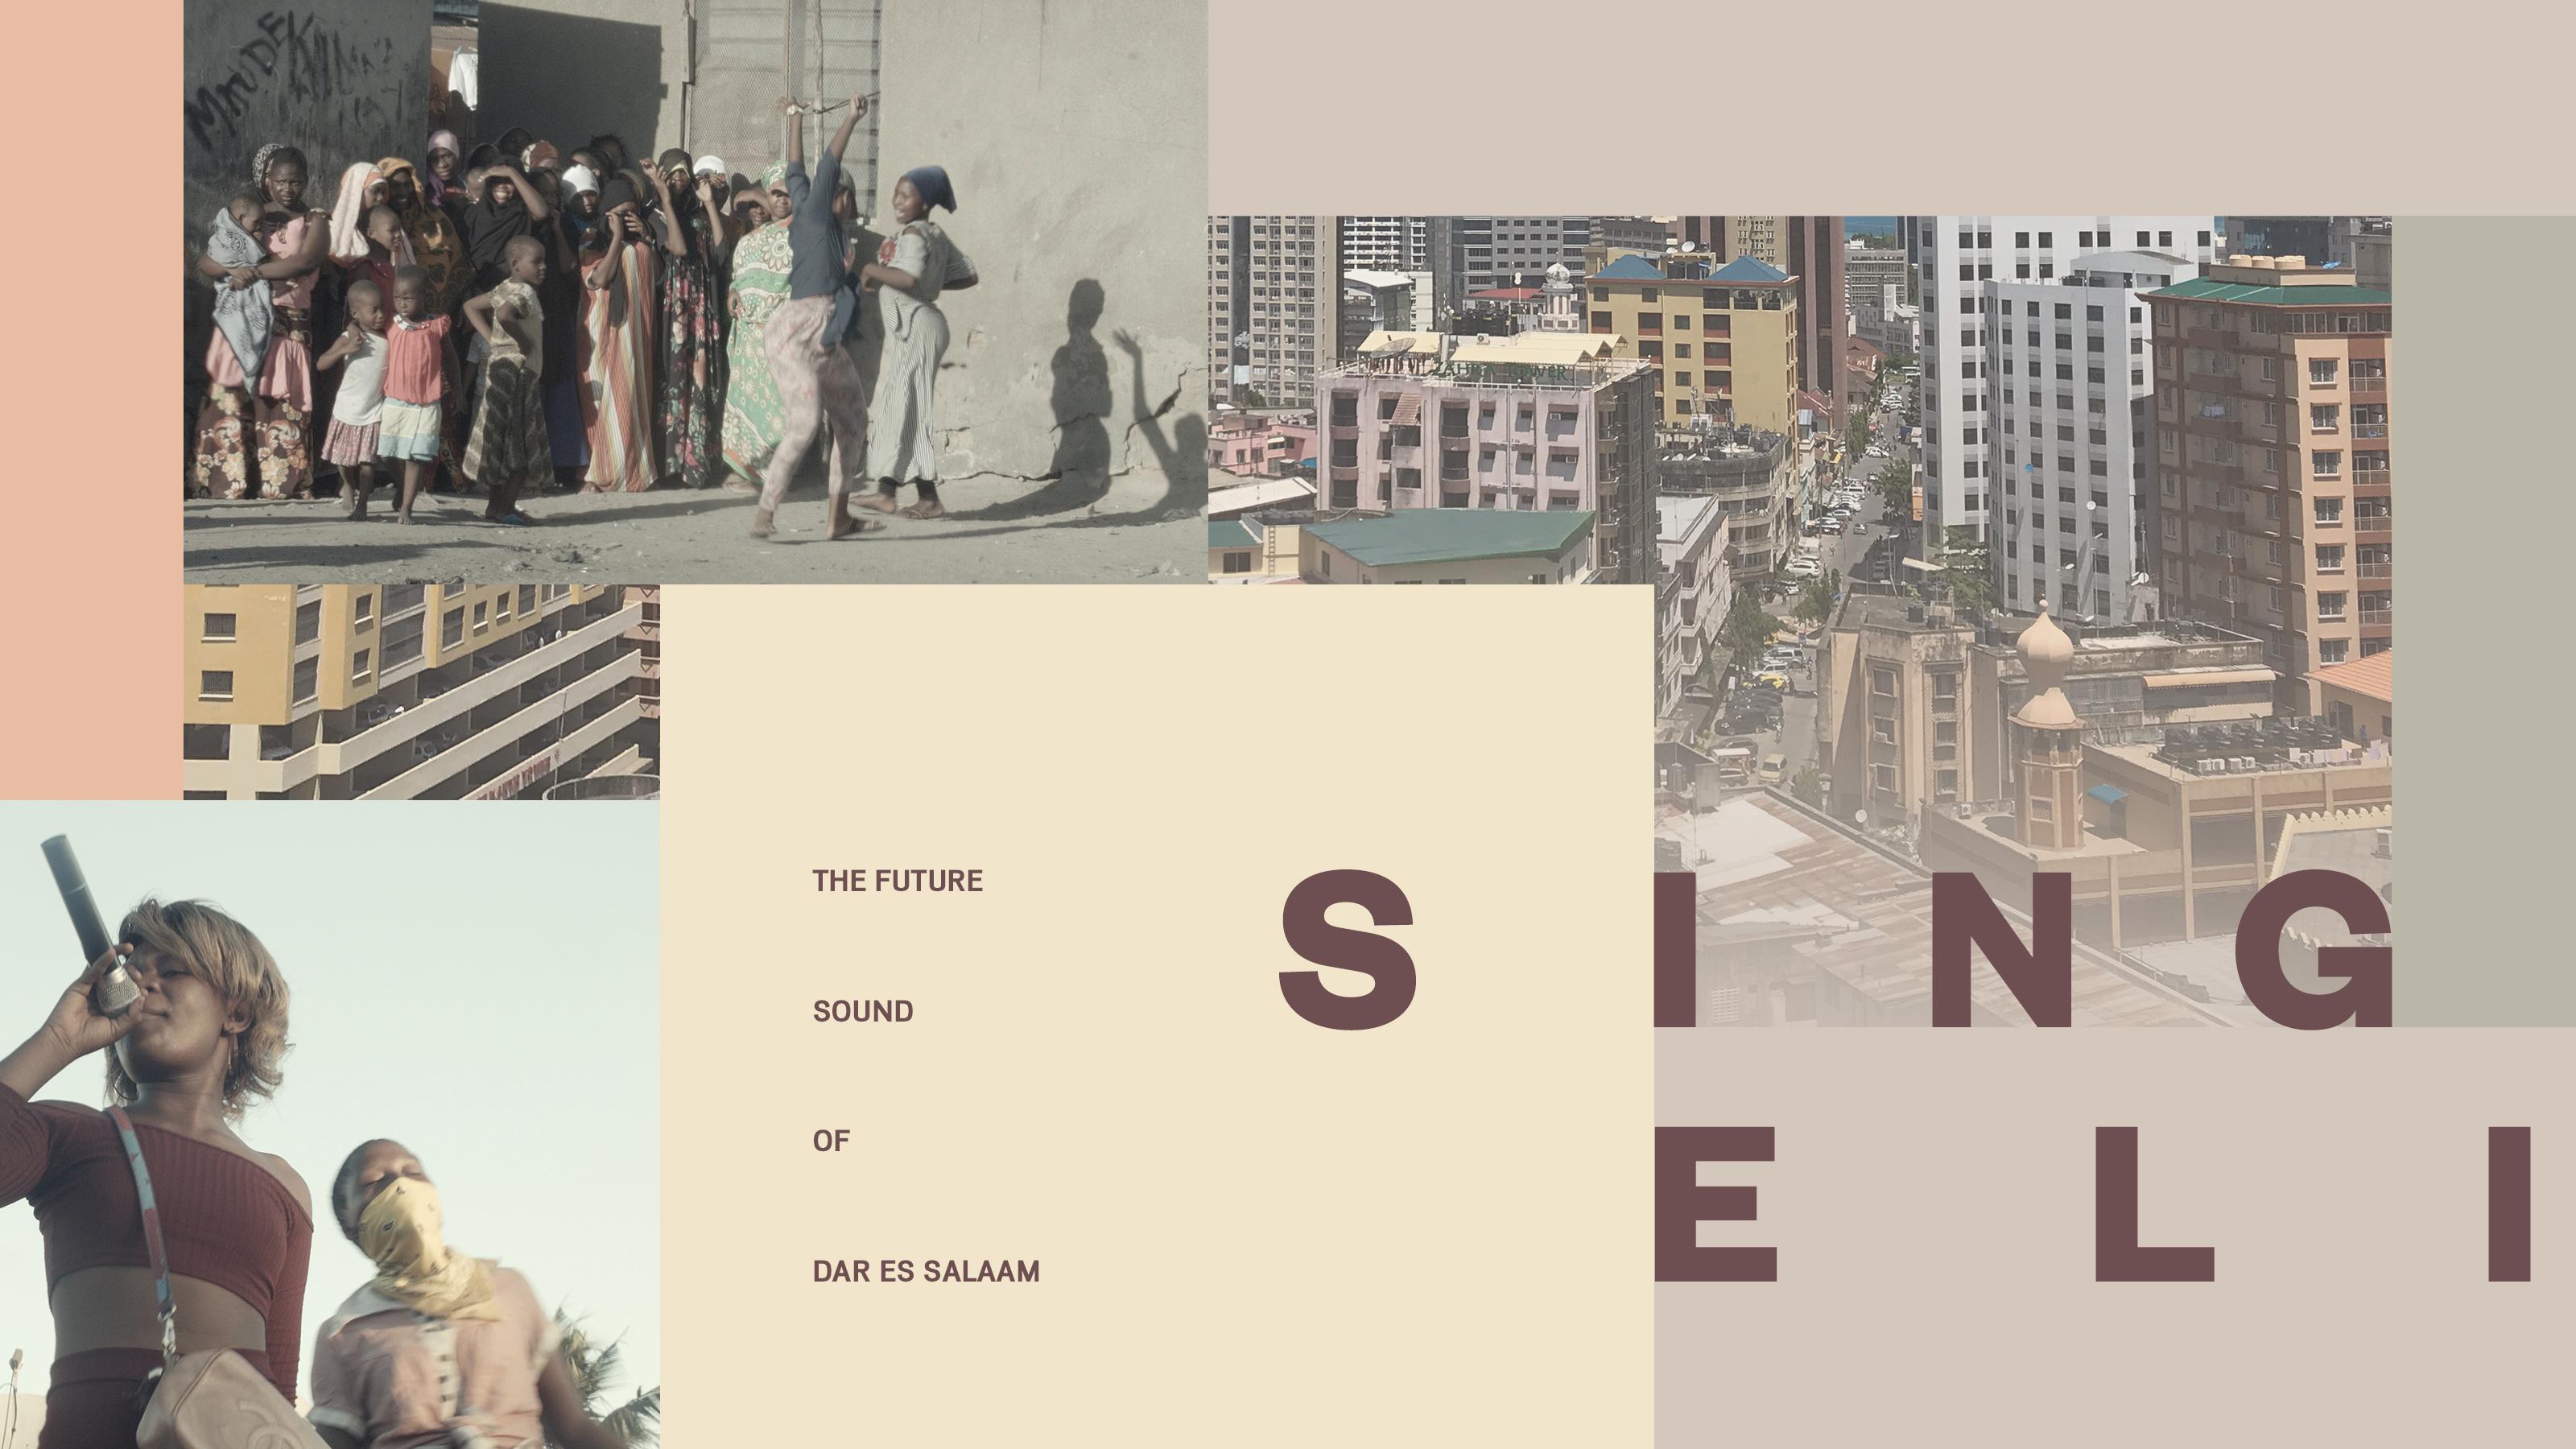 RA: Singeli: The future sound of Dar Es Salaam